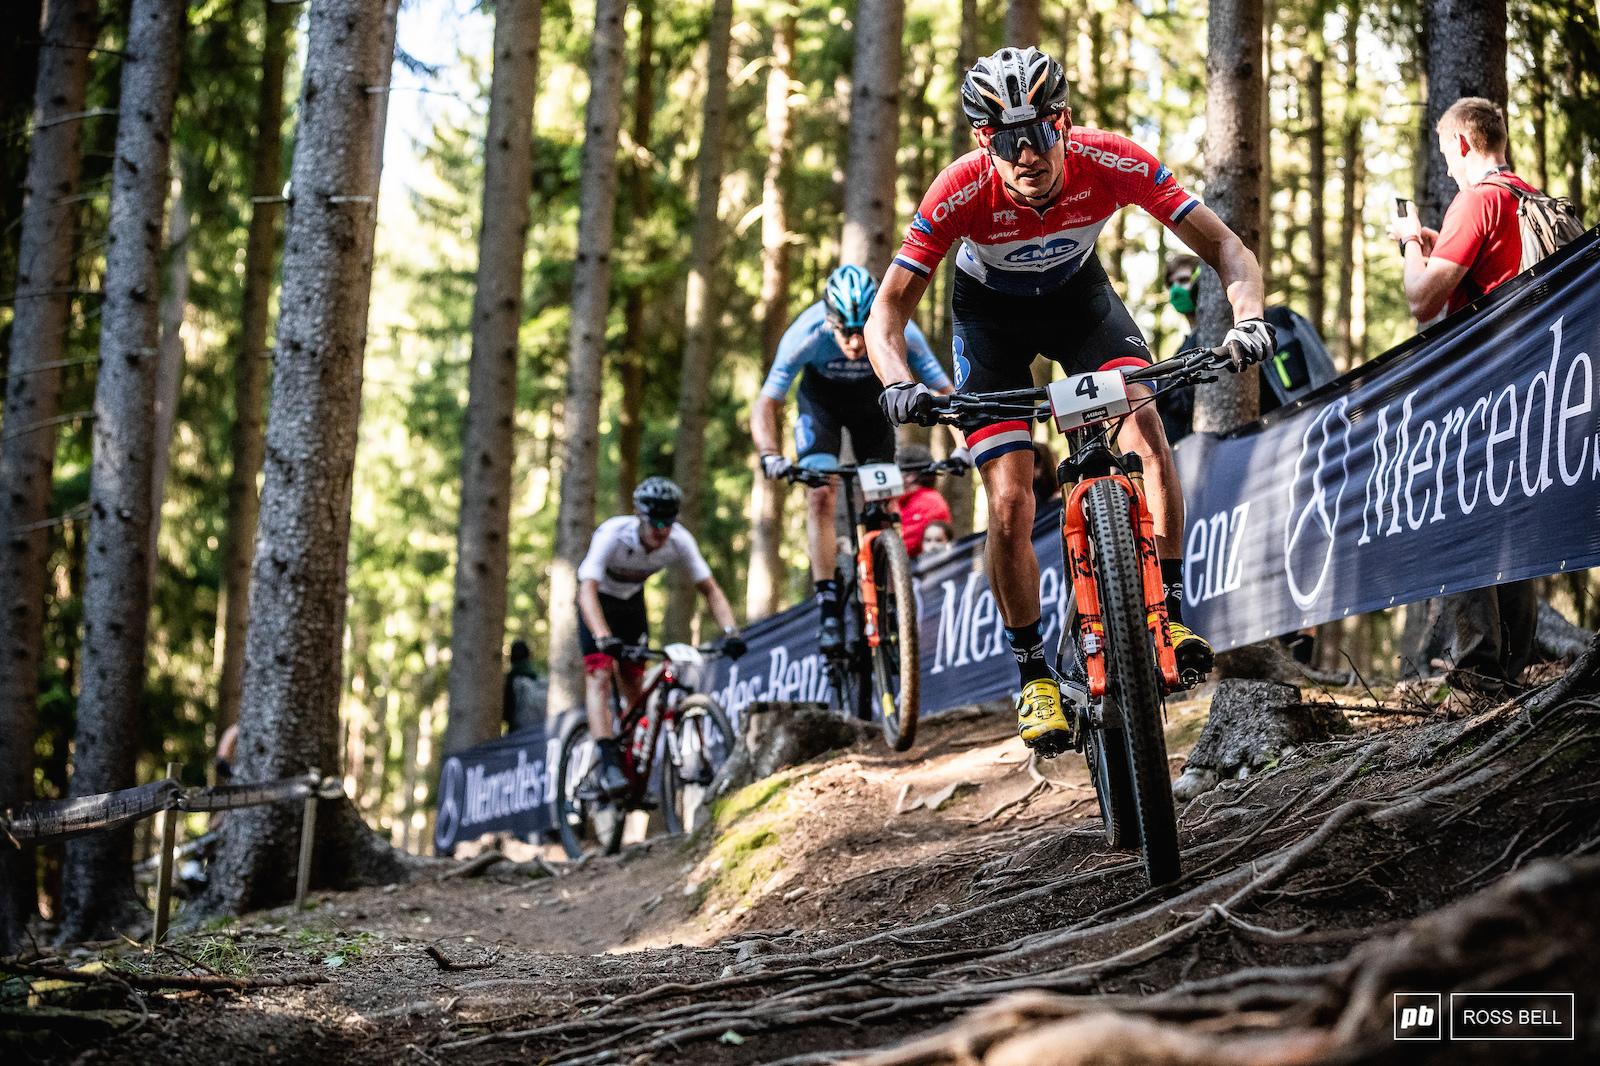 Milan Vadar has ridden super-strongly all week in Nove Mesto.